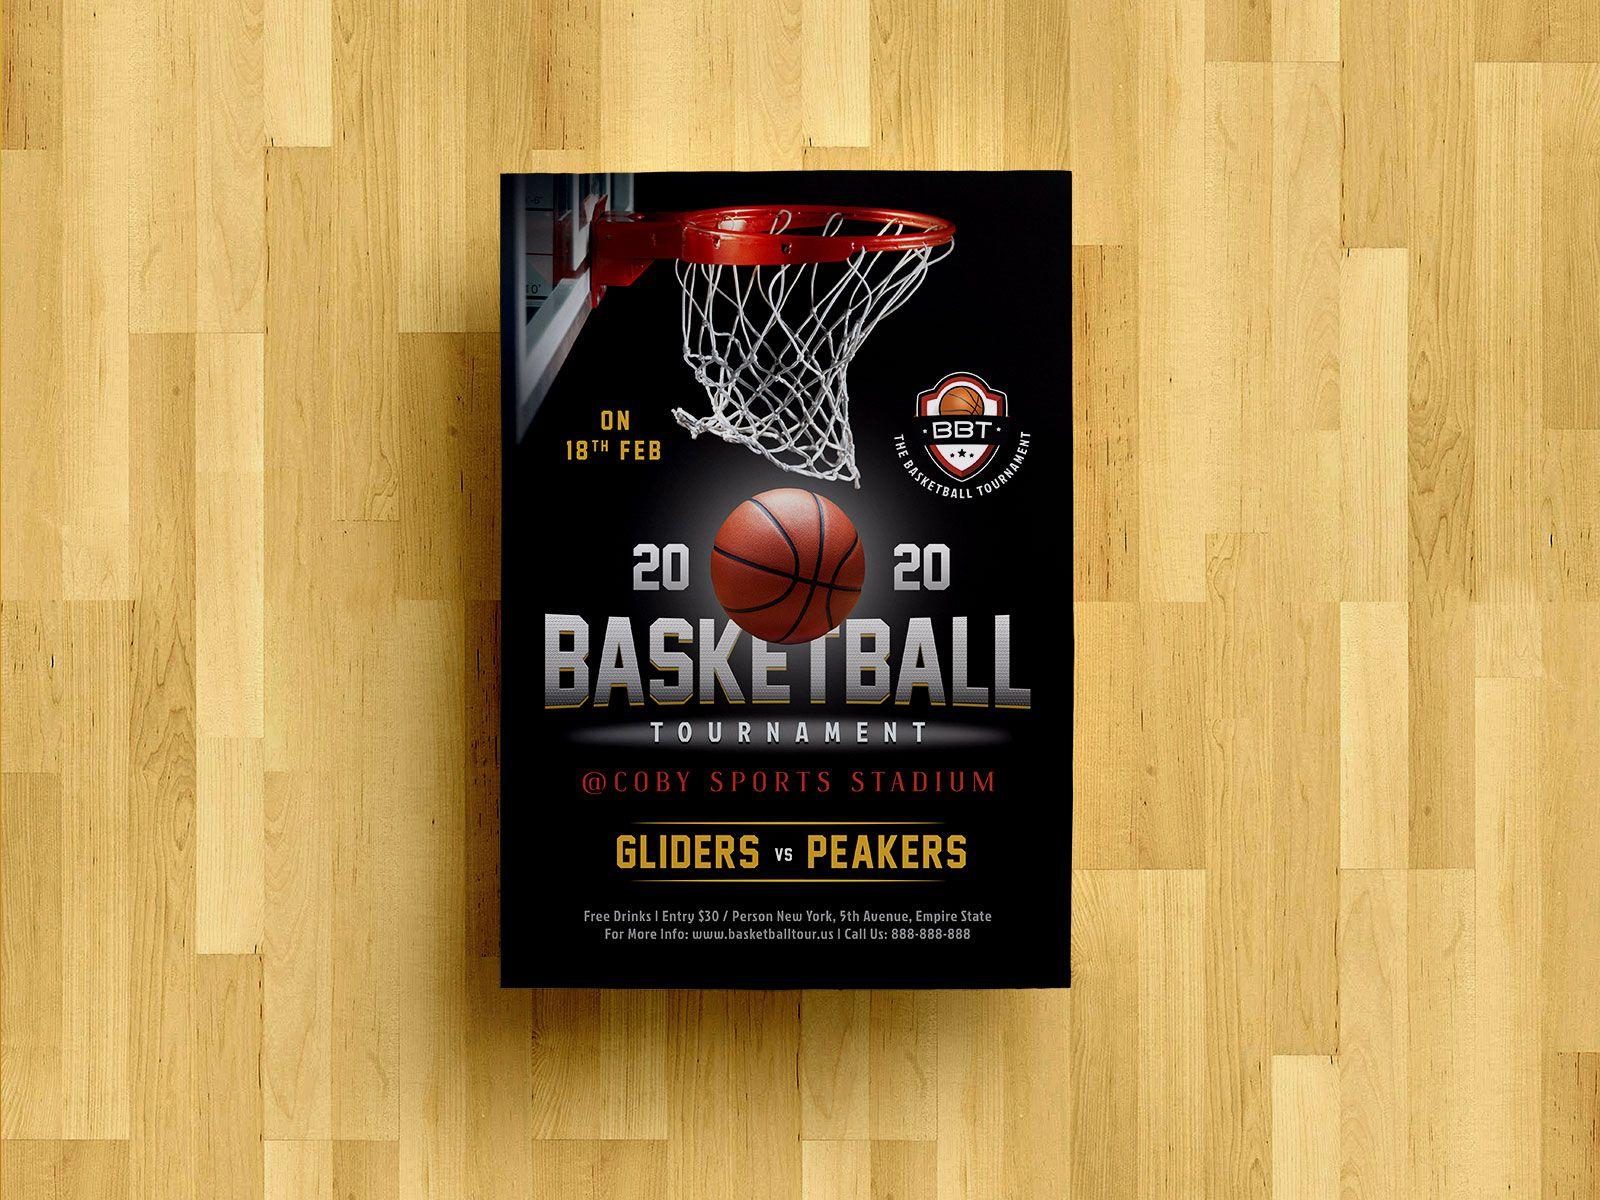 008 Striking Basketball Tournament Flyer Template Concept  3 On FreeFull